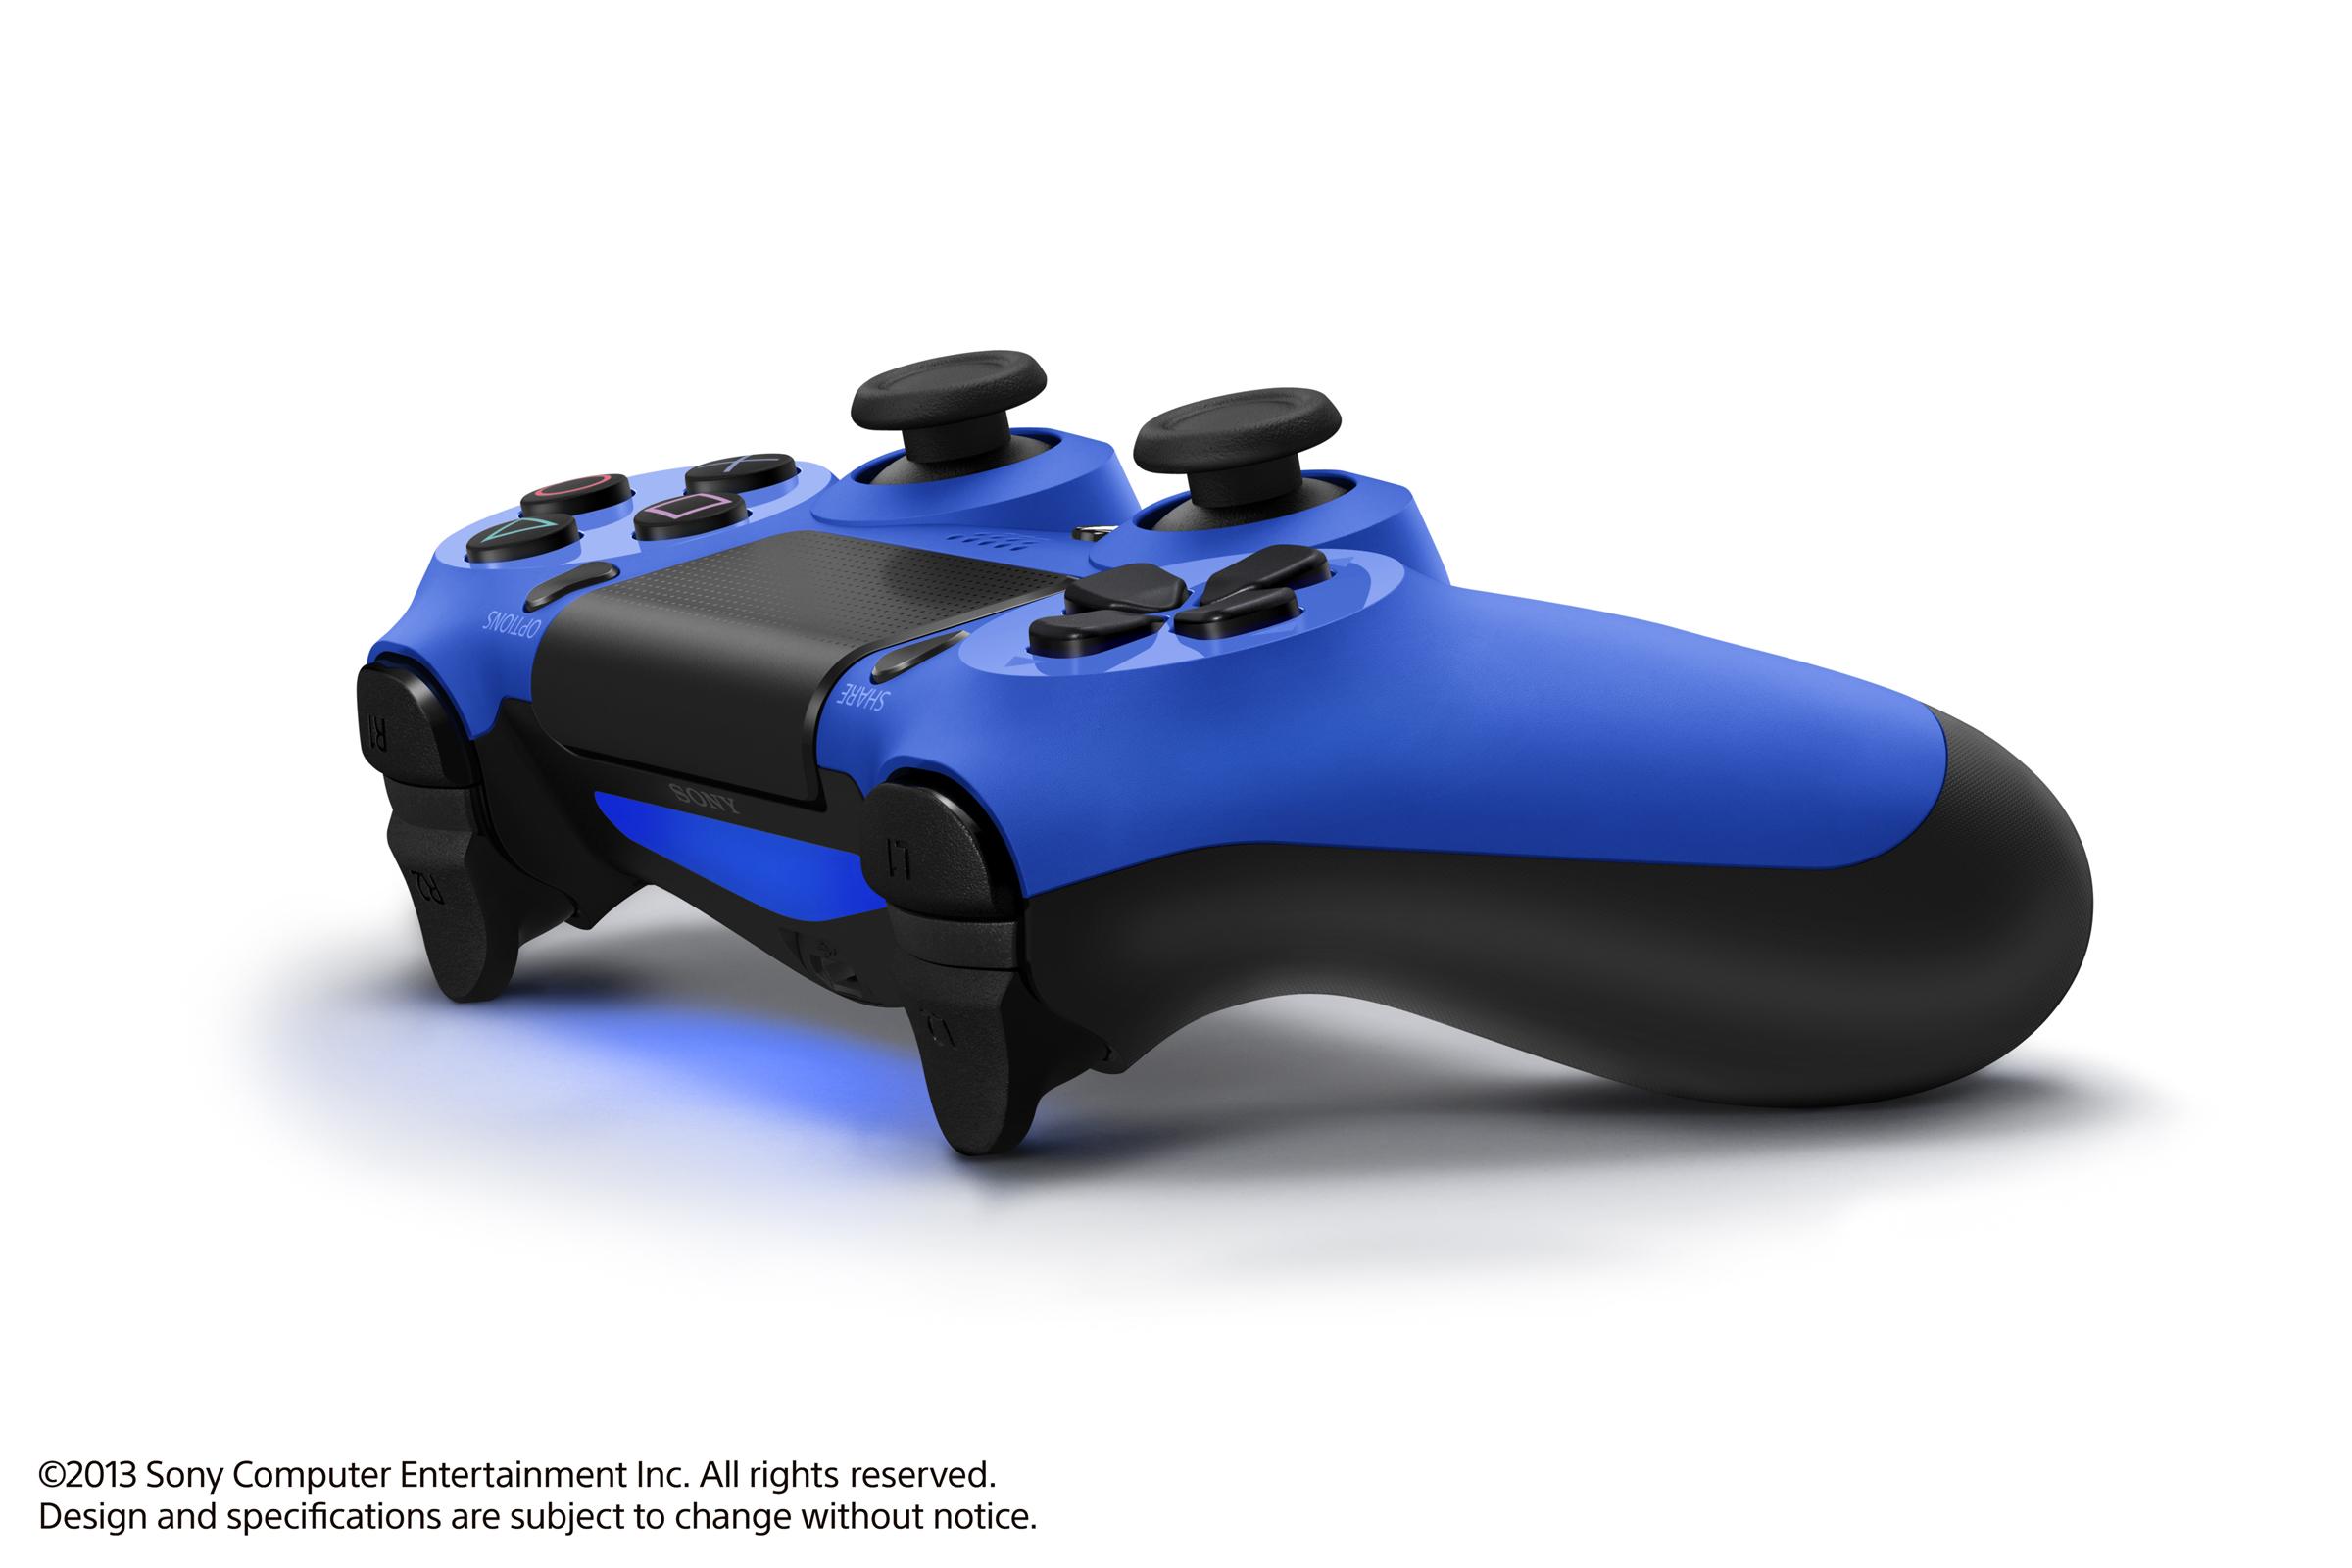 http://assets.vg247.com/current//2014/06/ps4_wave_blue_dualshock_controller_1.jpg